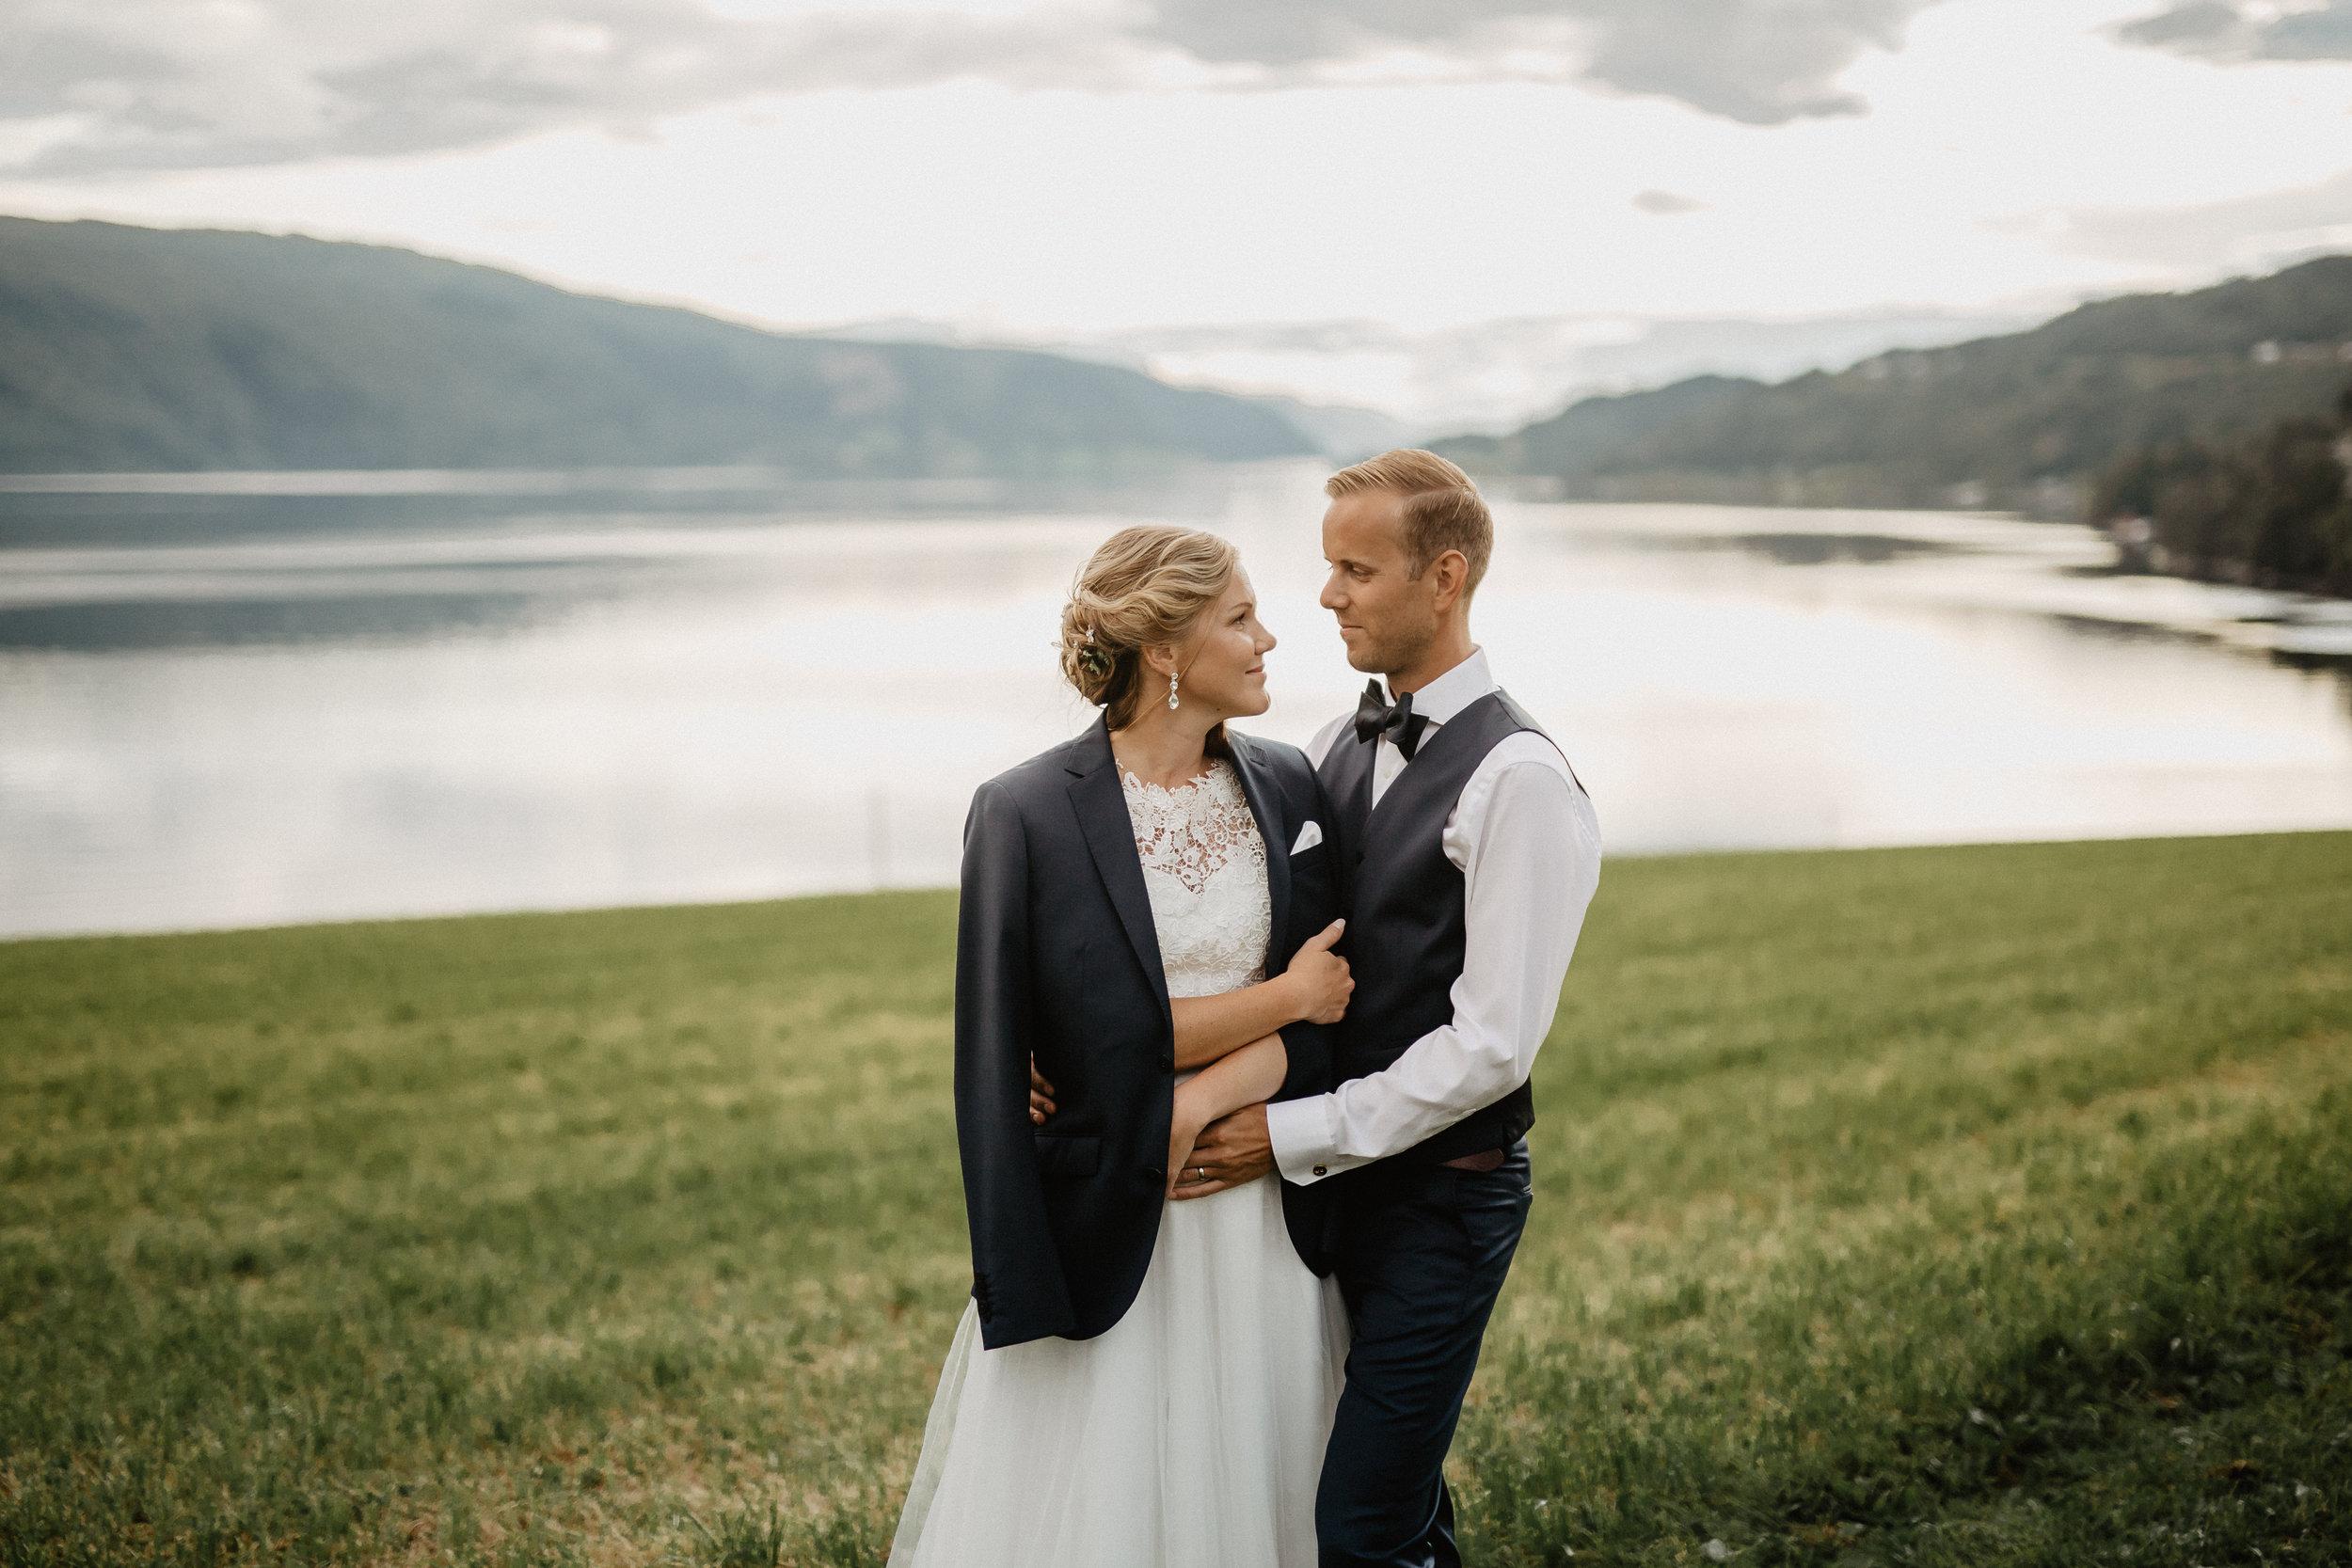 Fotograf Kristin Solem_Silje og Johan (61 of 860).jpg